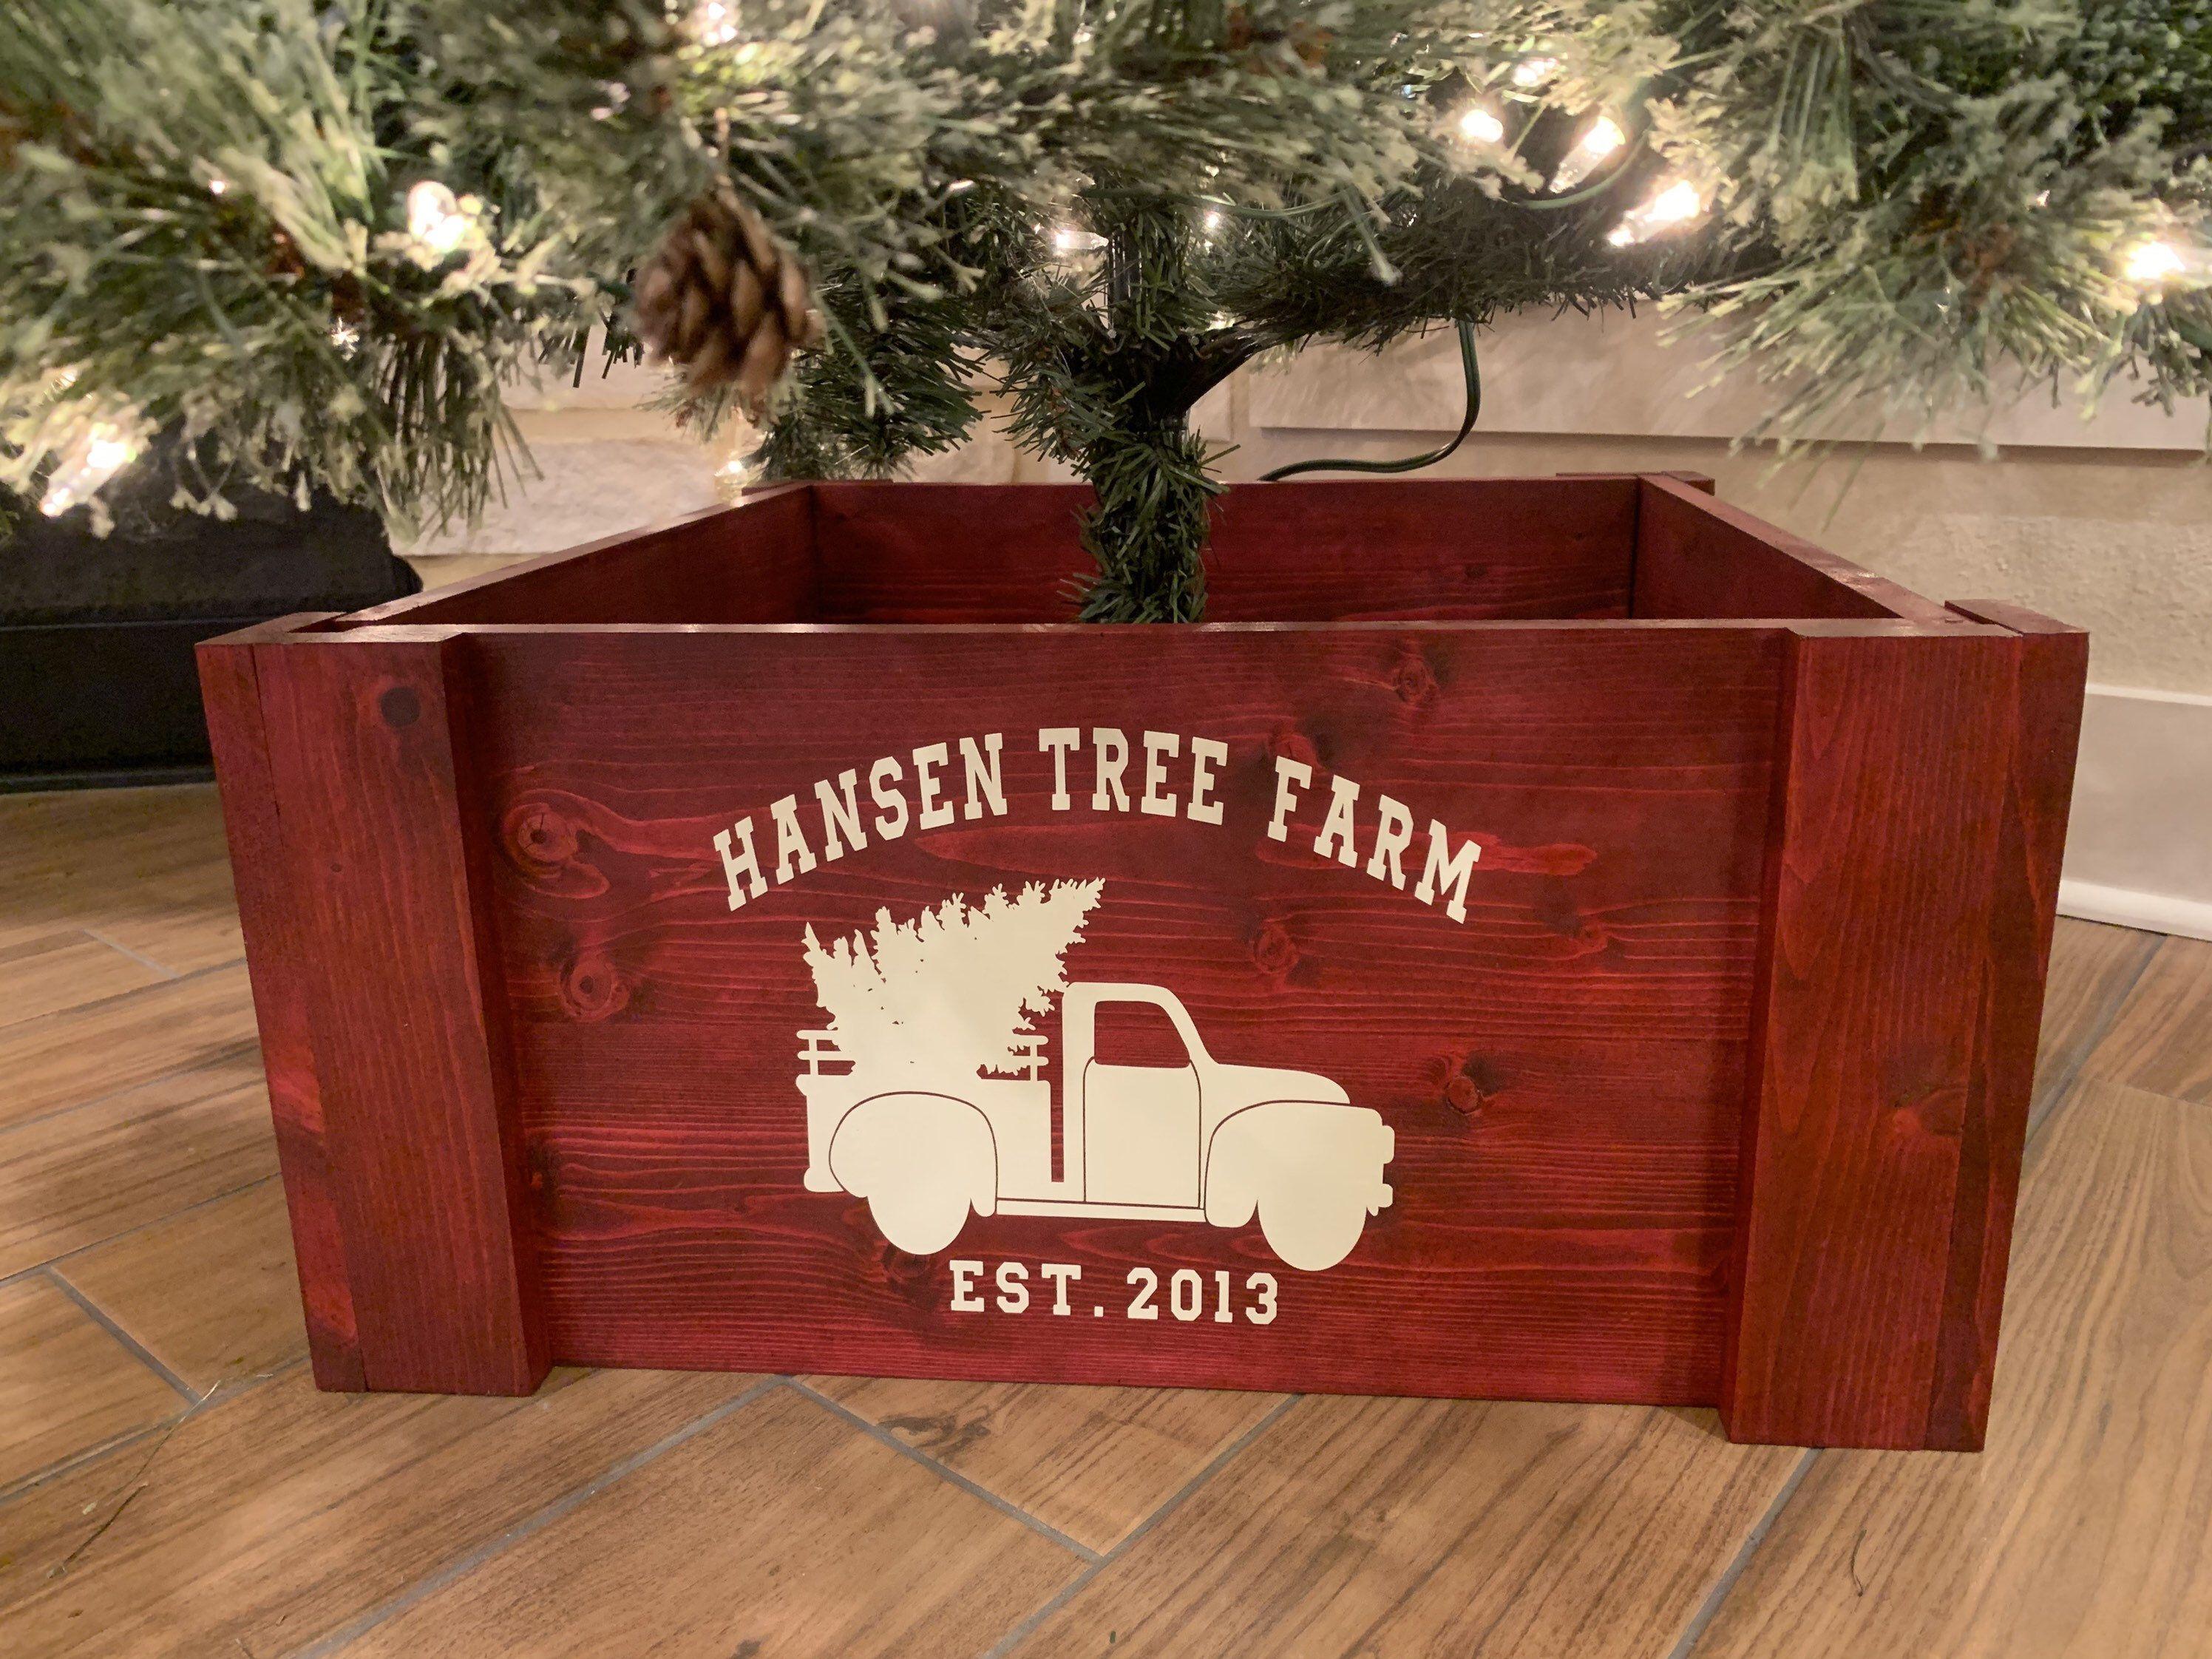 Christmas Tree Box Stand Wooden Tree Skirt Christmas Tree Etsy In 2020 Christmas Tree Box Christmas Tree Box Stand Collapsible Christmas Tree